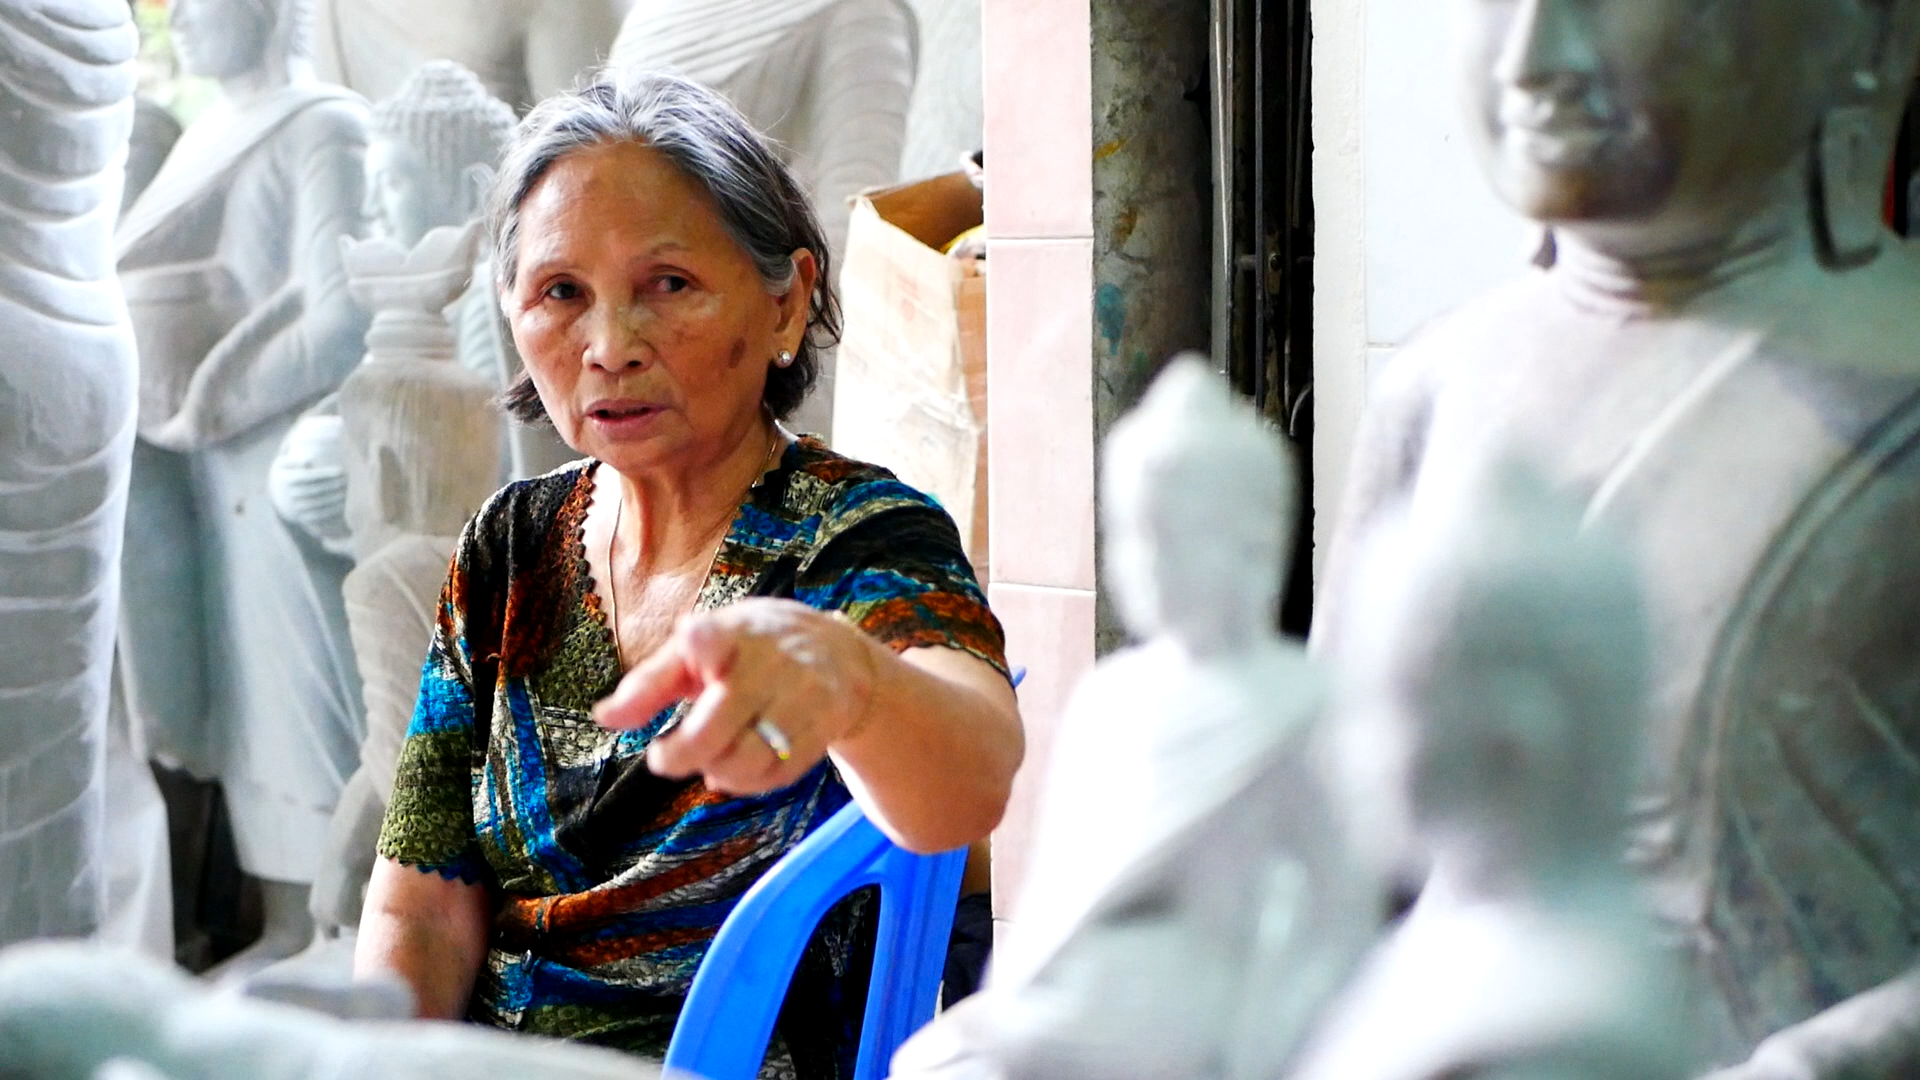 Copy of Woman Sculptor (ជាងចម្លាក់) | REMIX Phnom Penh 2019